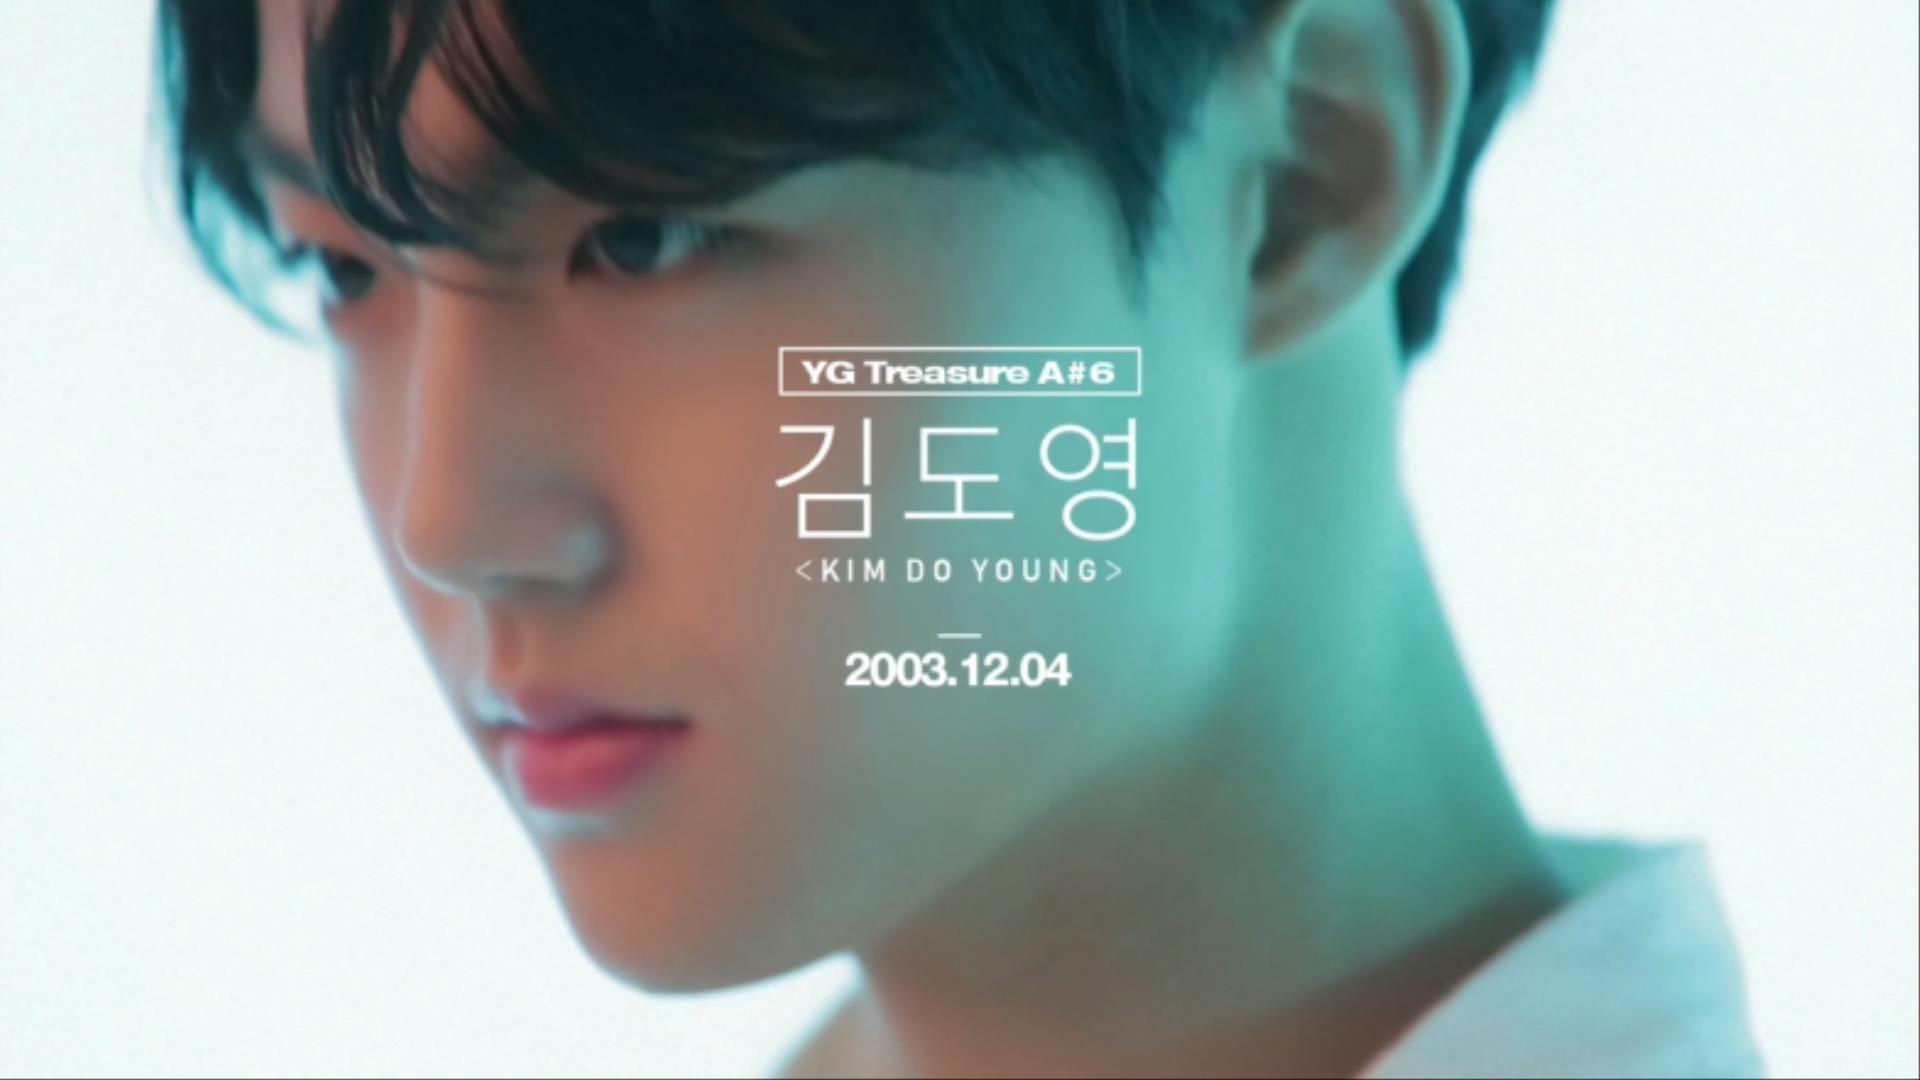 V Live Yg보석함ㅣa 6 김도영 Kim Doyoung Profile Making Film